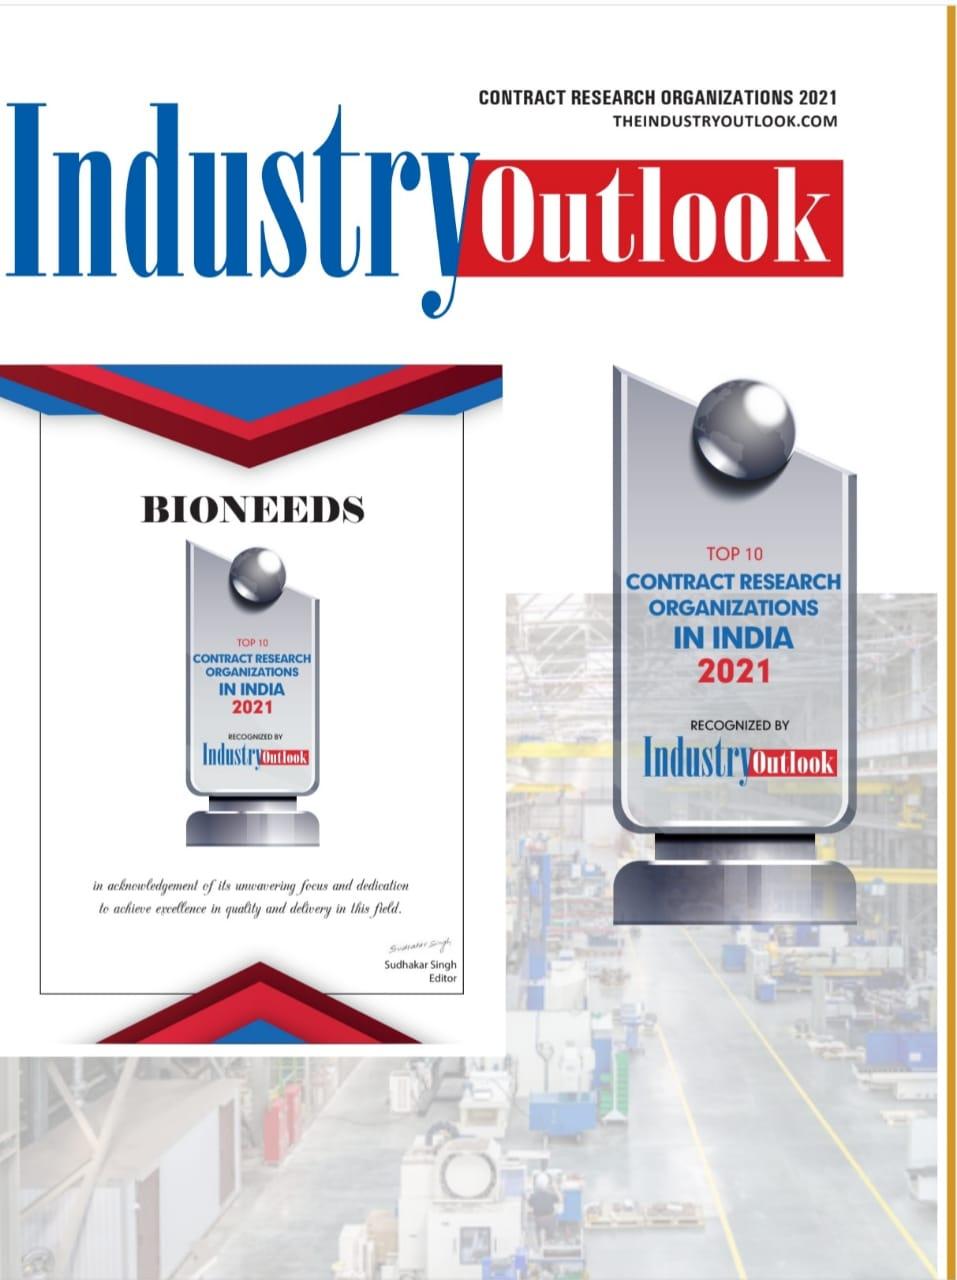 Industry Outlook Bioneeds